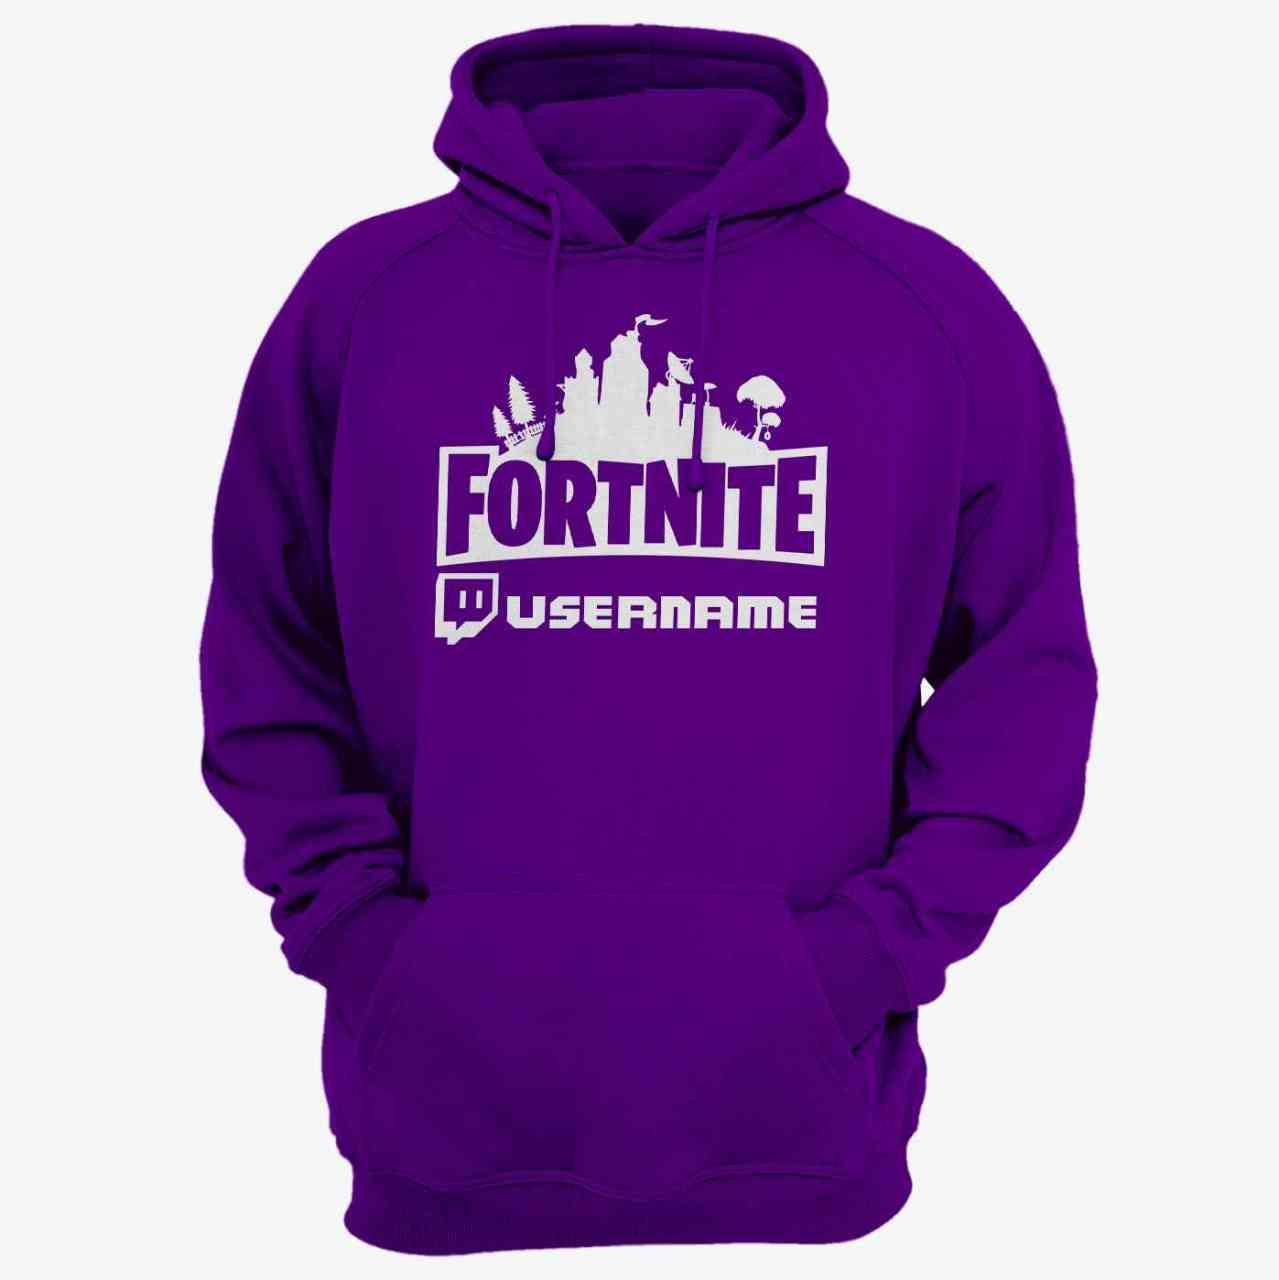 Fortnite Hoodie mit Twitch Name | Battle Royal | Pulli | Unisex | personalisiert - Lila - Purple